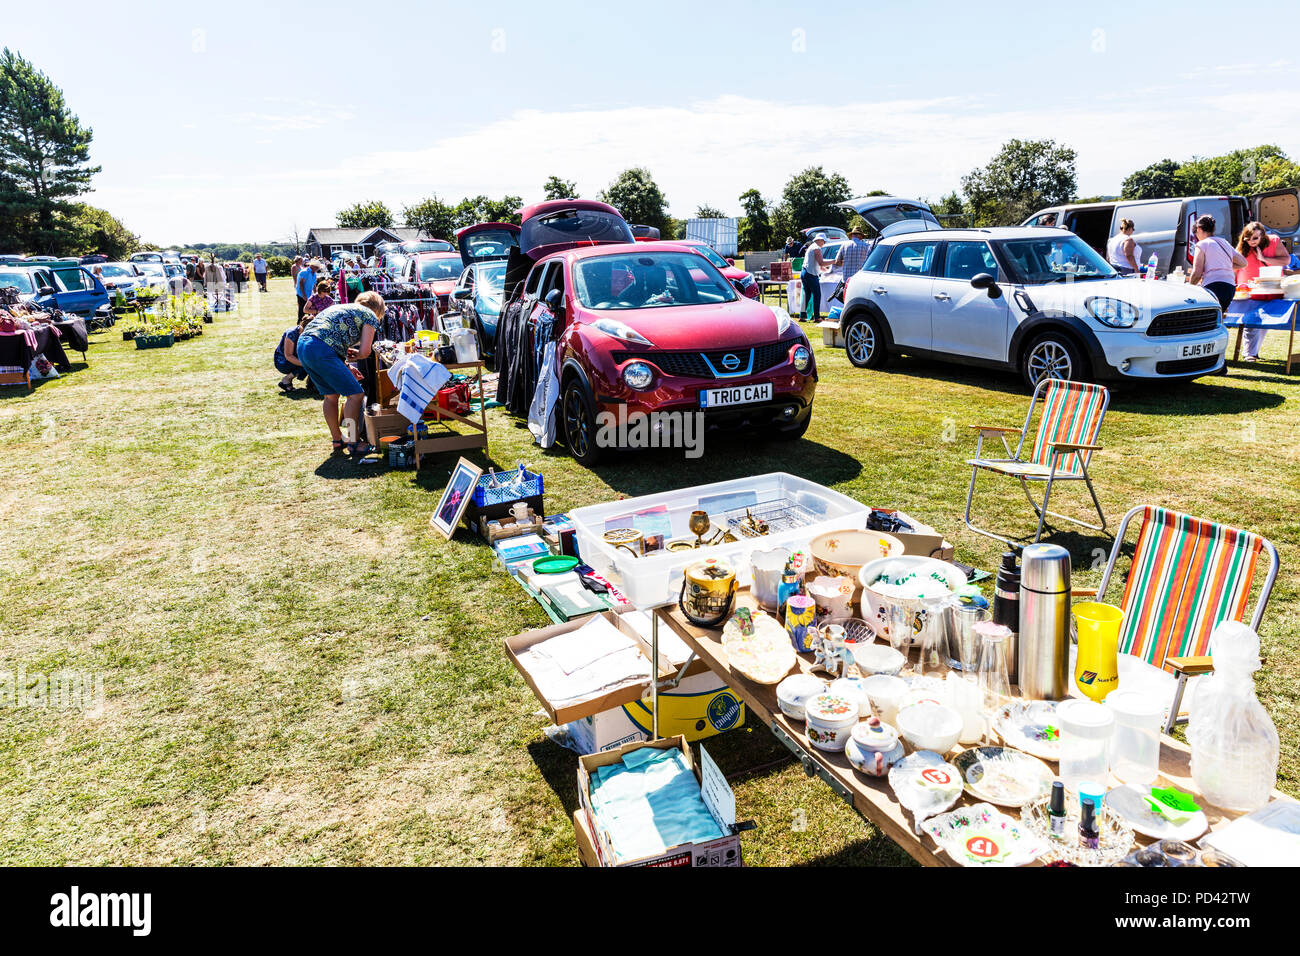 Car Boot, car boot sale, car boot sales, boot sale, boot sales, selling junk, stall, car boot stalls, car boot stall, car boot, sale, sales, UK, - Stock Image